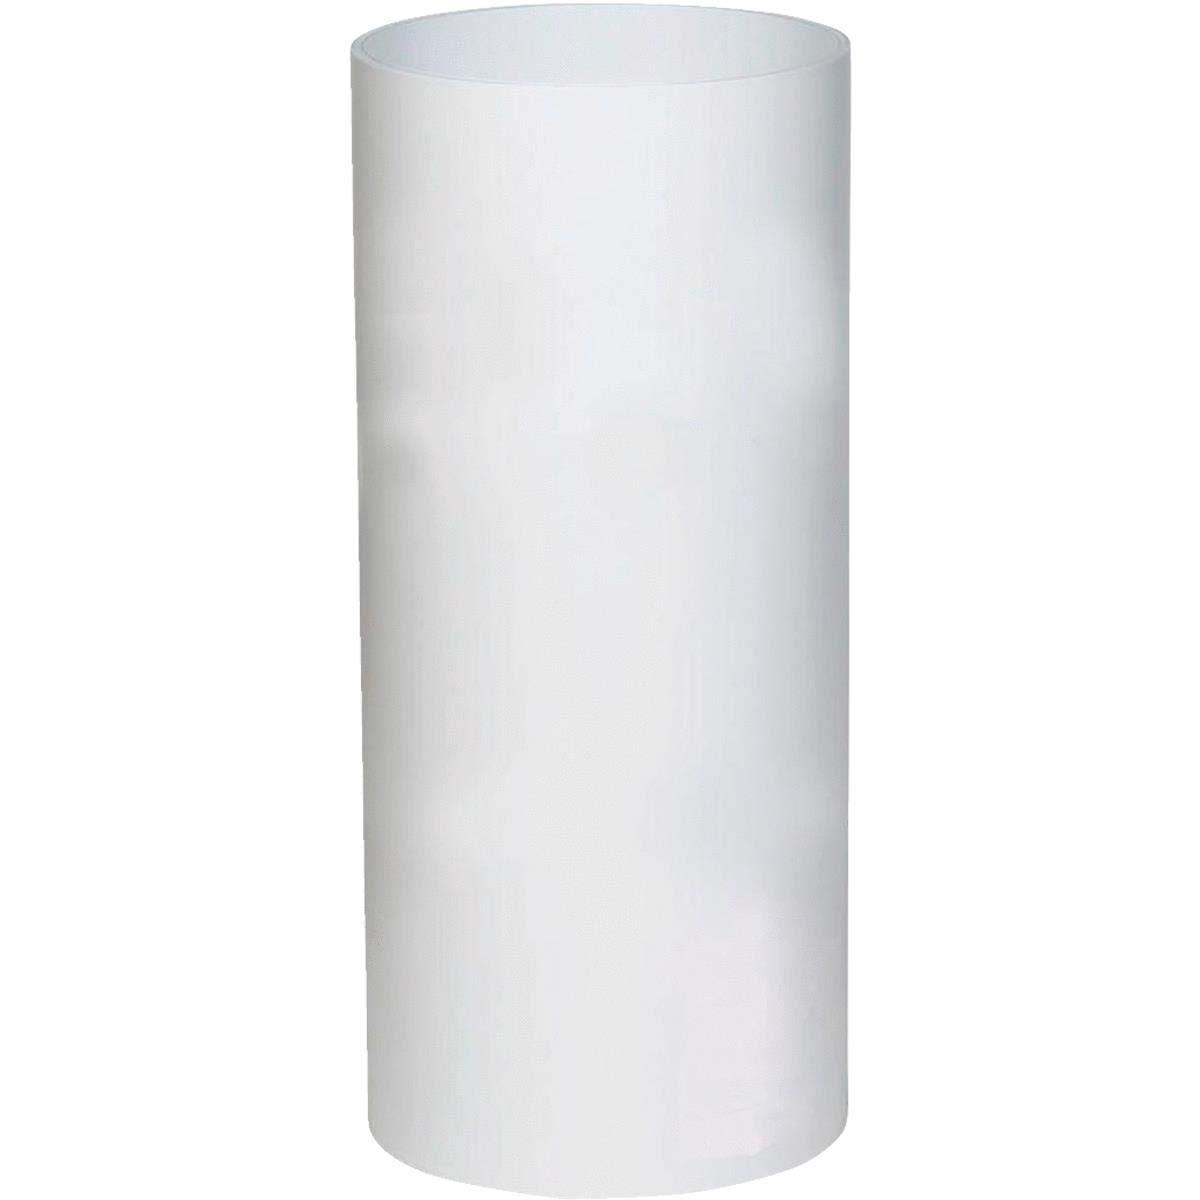 "Amerimax Home Products 69124182 Aluminum Trim Coil, 24""/50', Bright White"